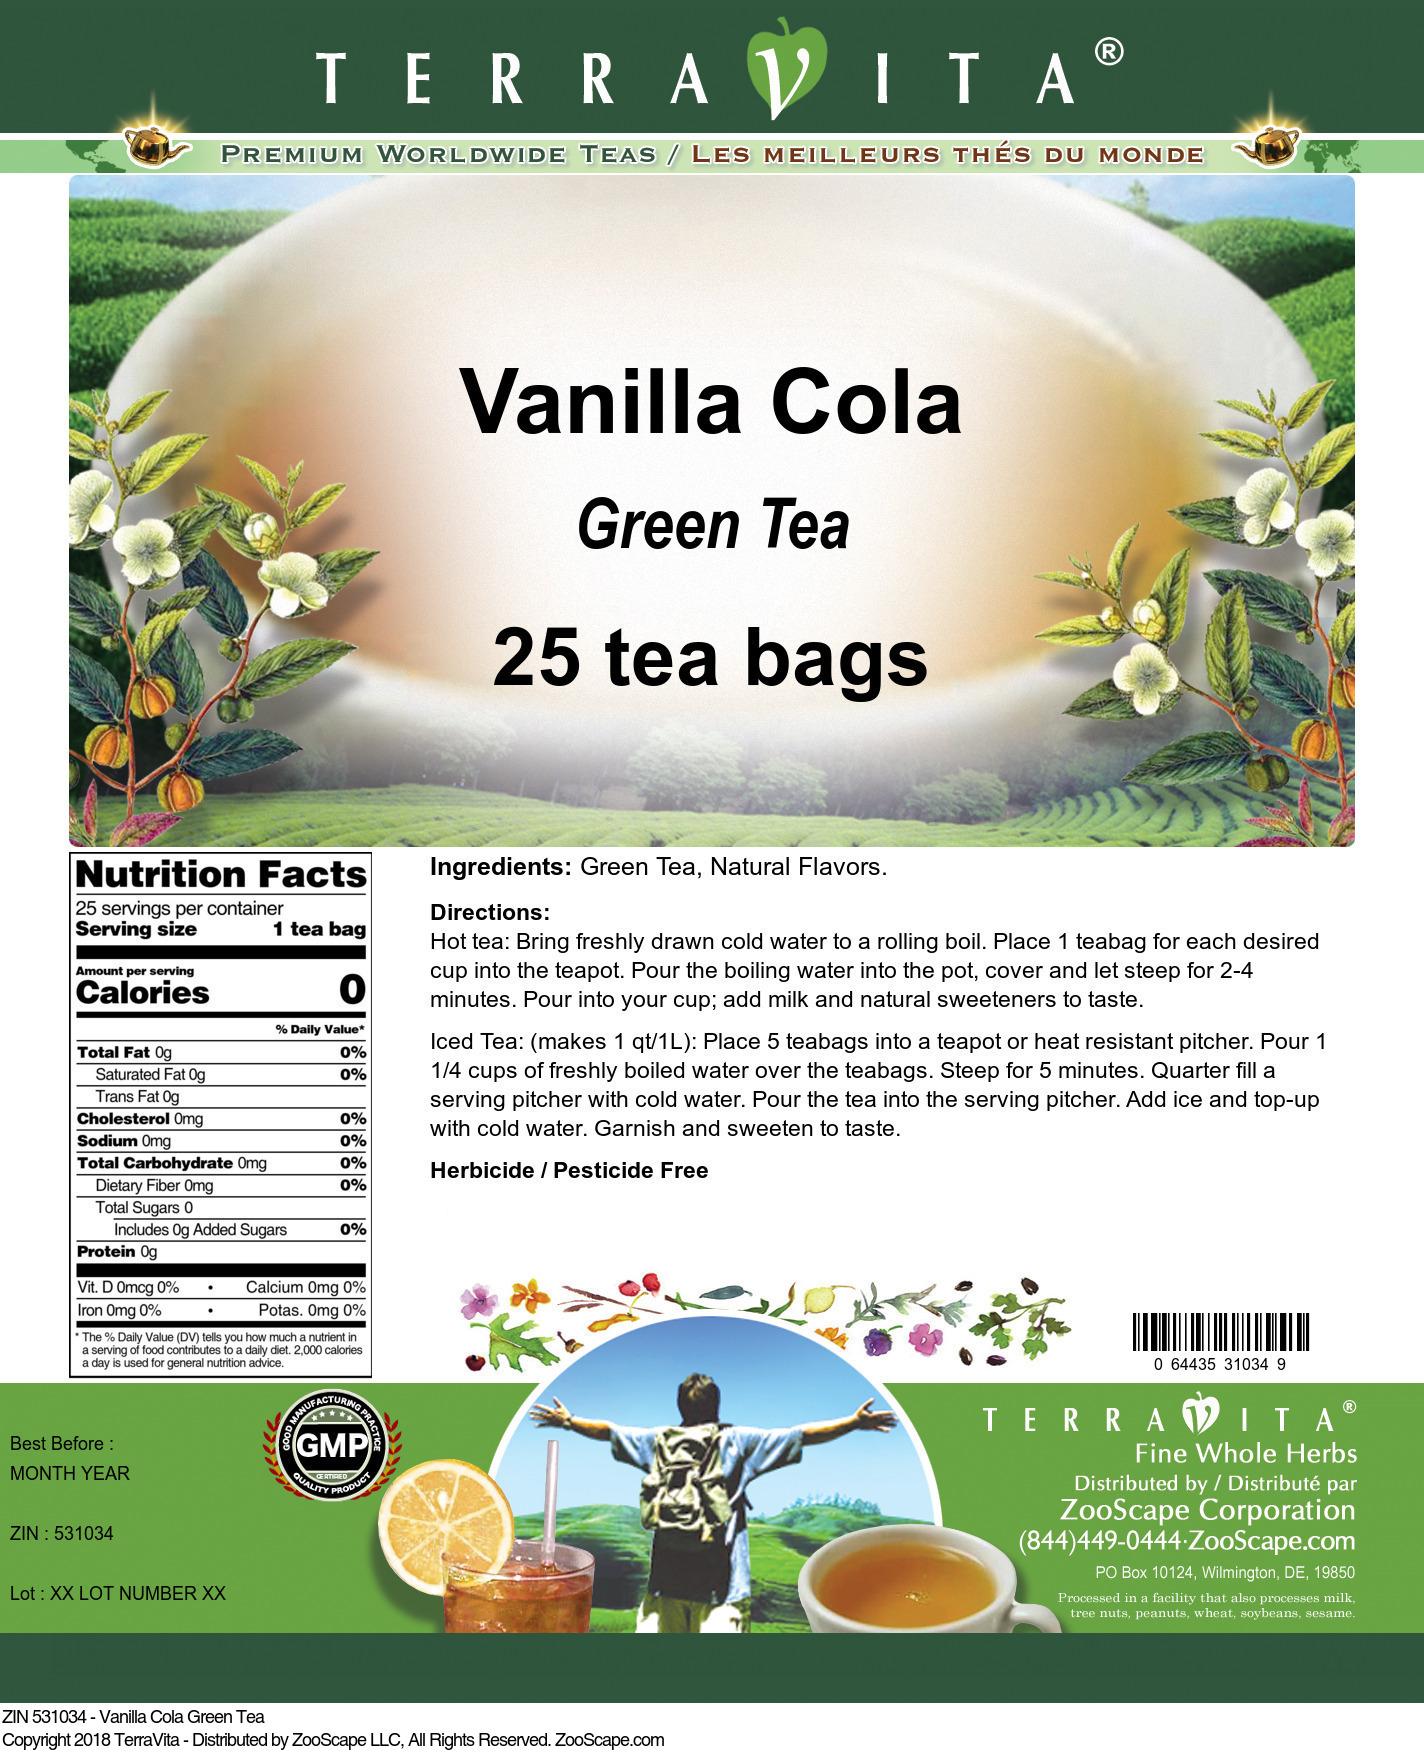 Vanilla Cola Green Tea